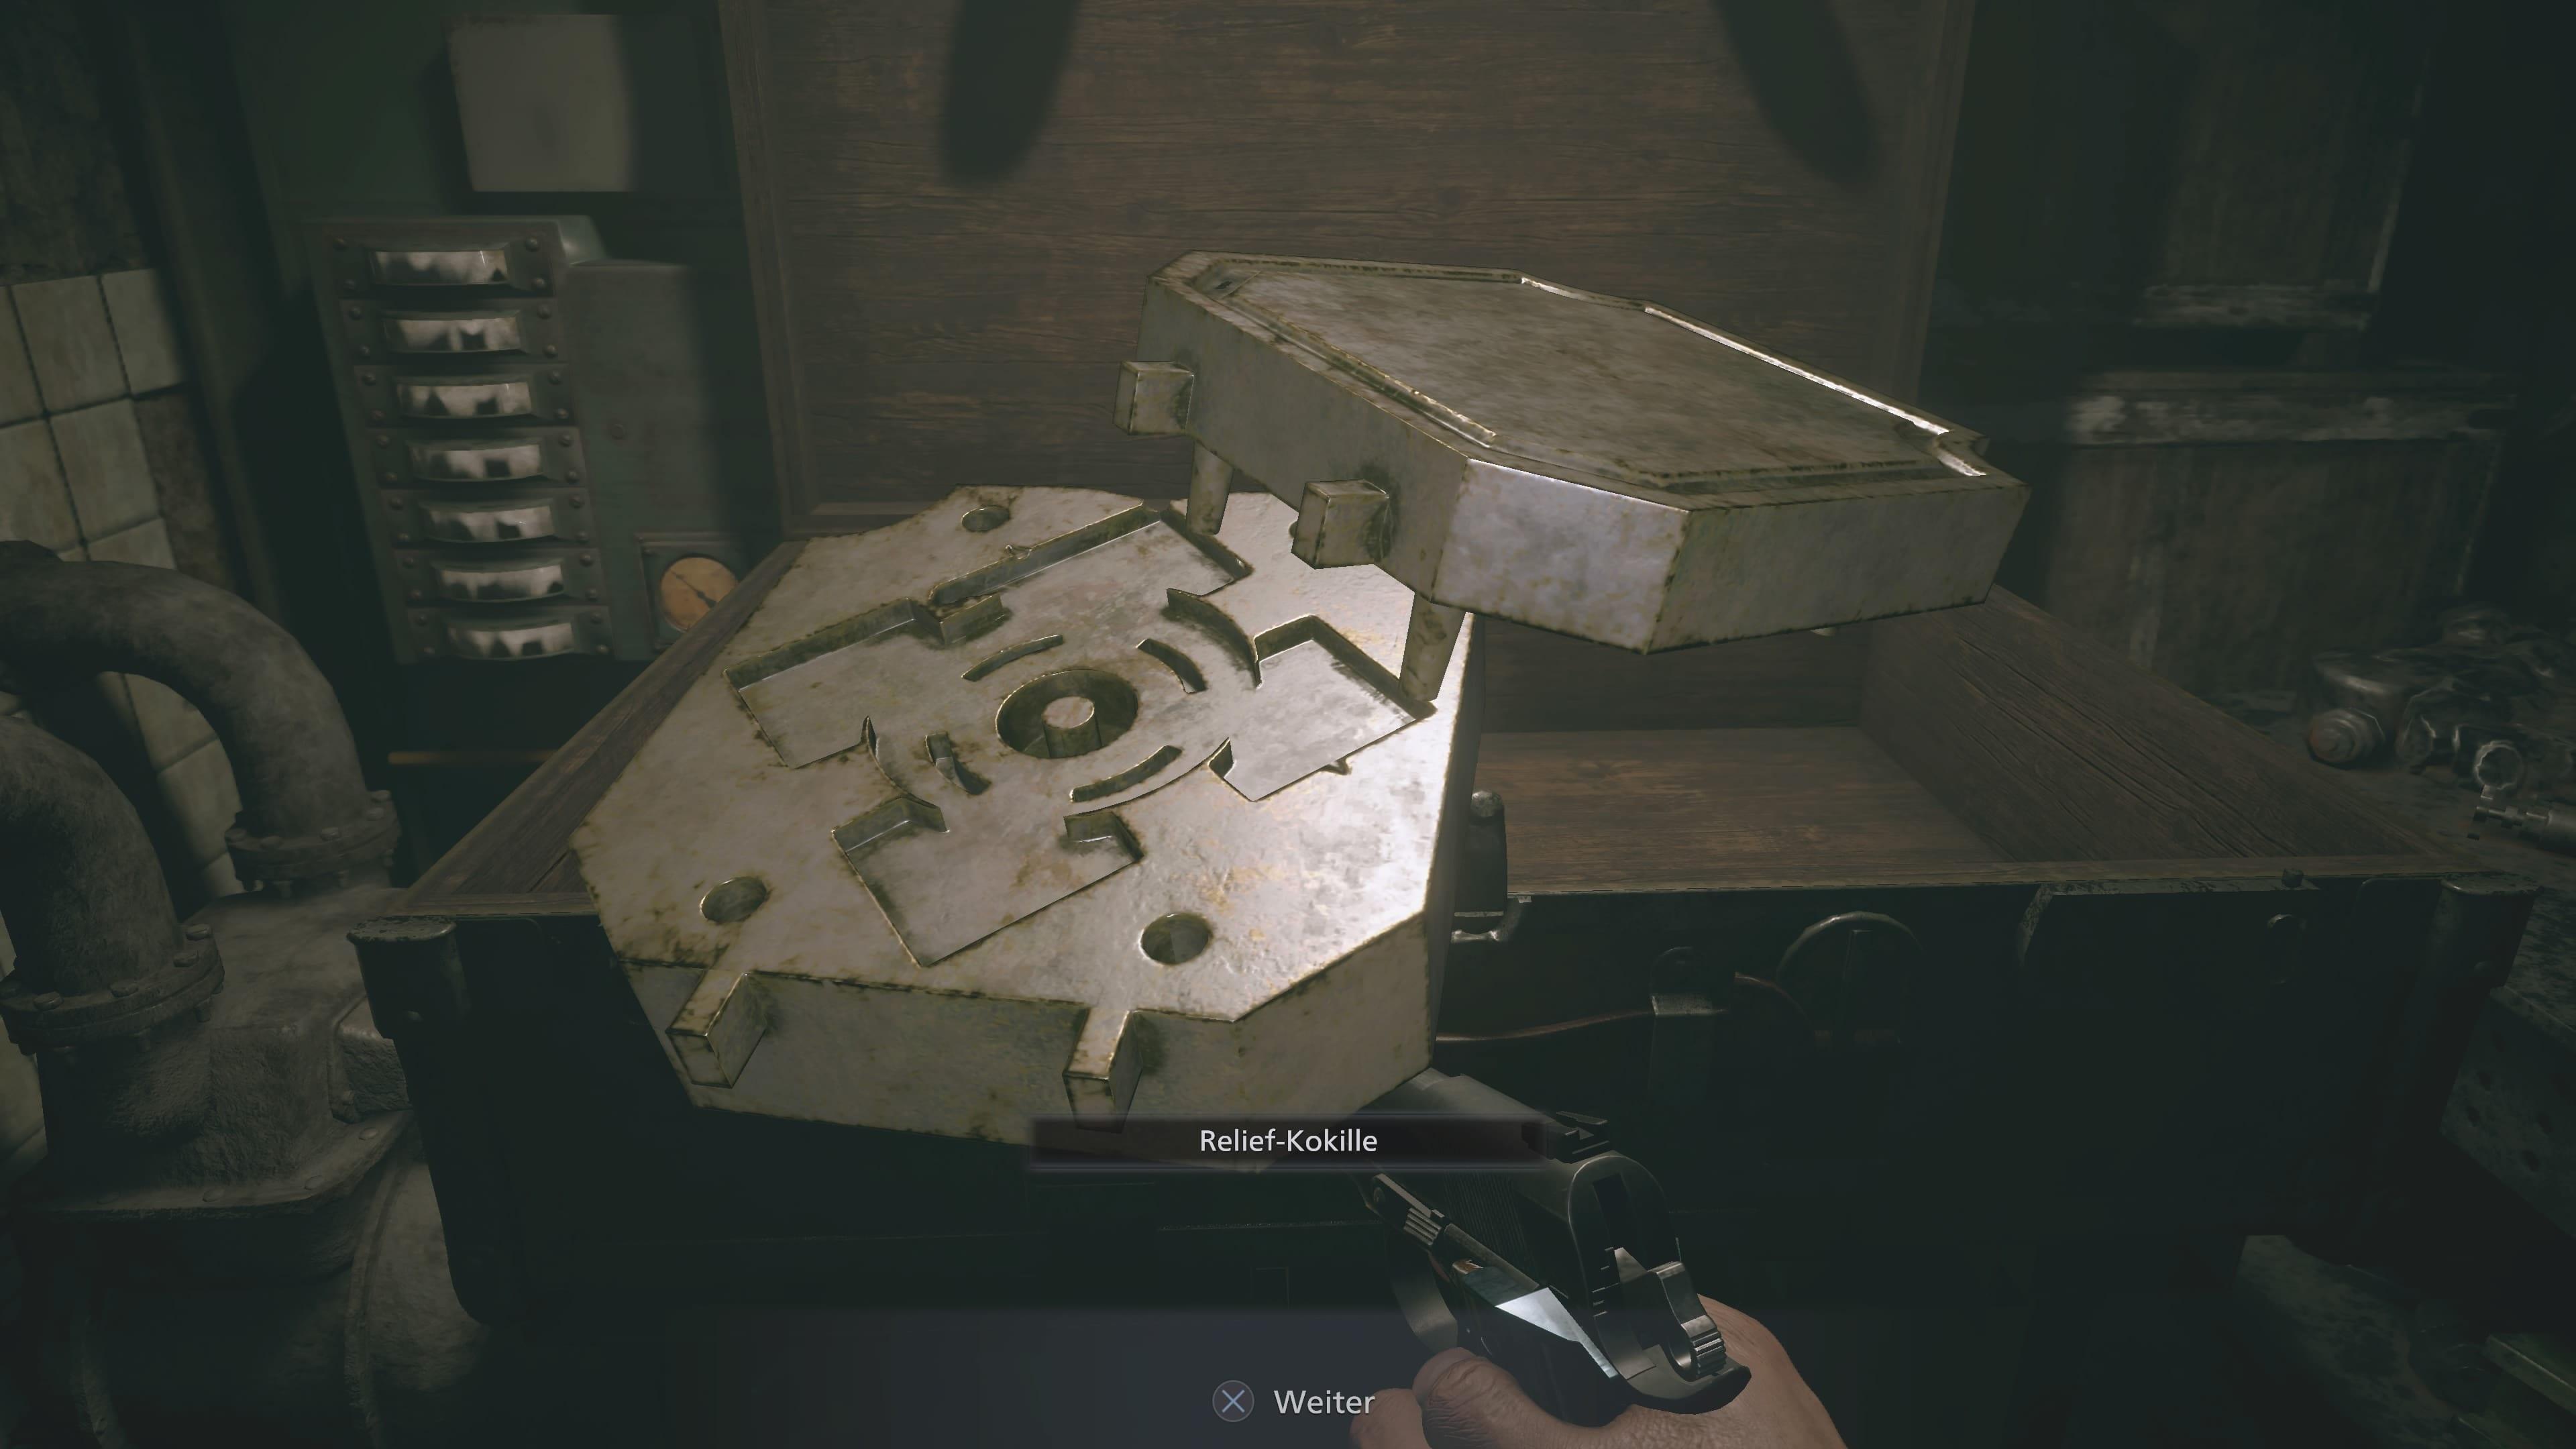 Resident Evil 8: Relief-Kokille (Lösung)